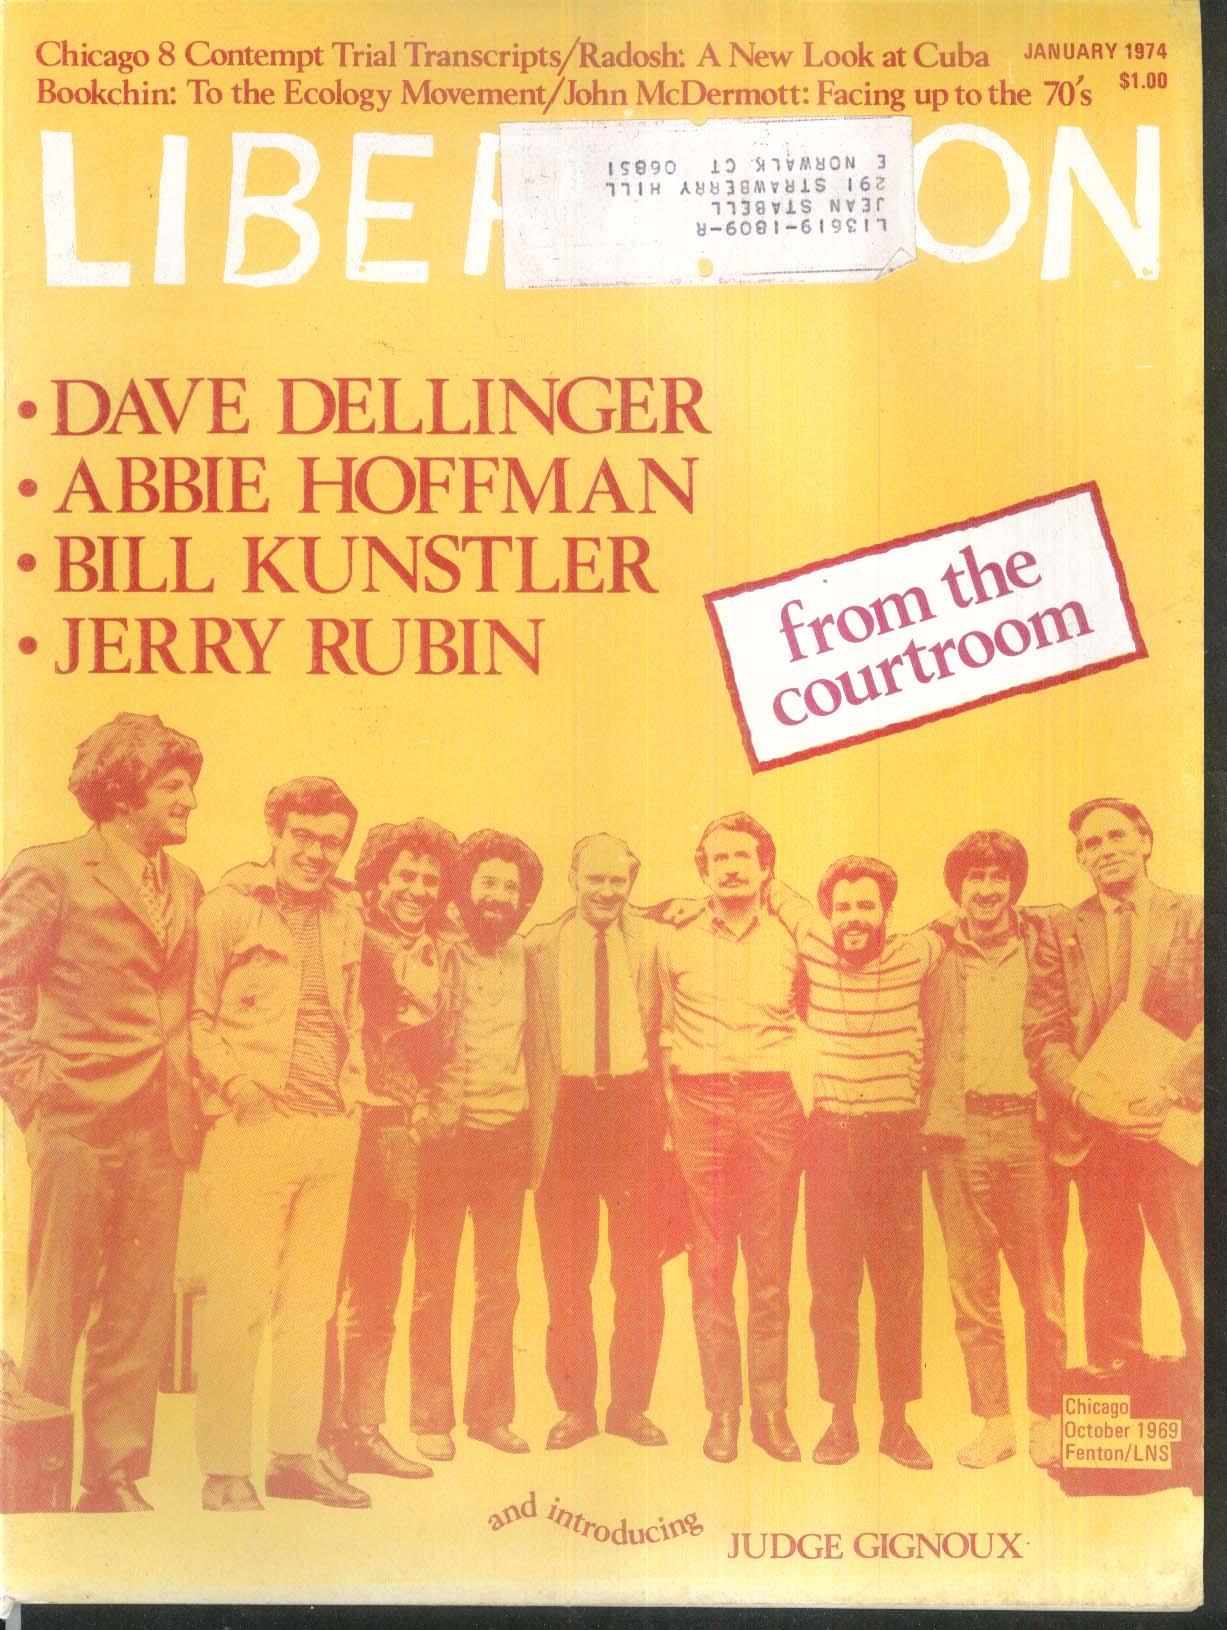 LIBERATION Dave Dellinger Abbie Hoffman Bill Kunstler Jerry Rubin Gignoux 1 1974